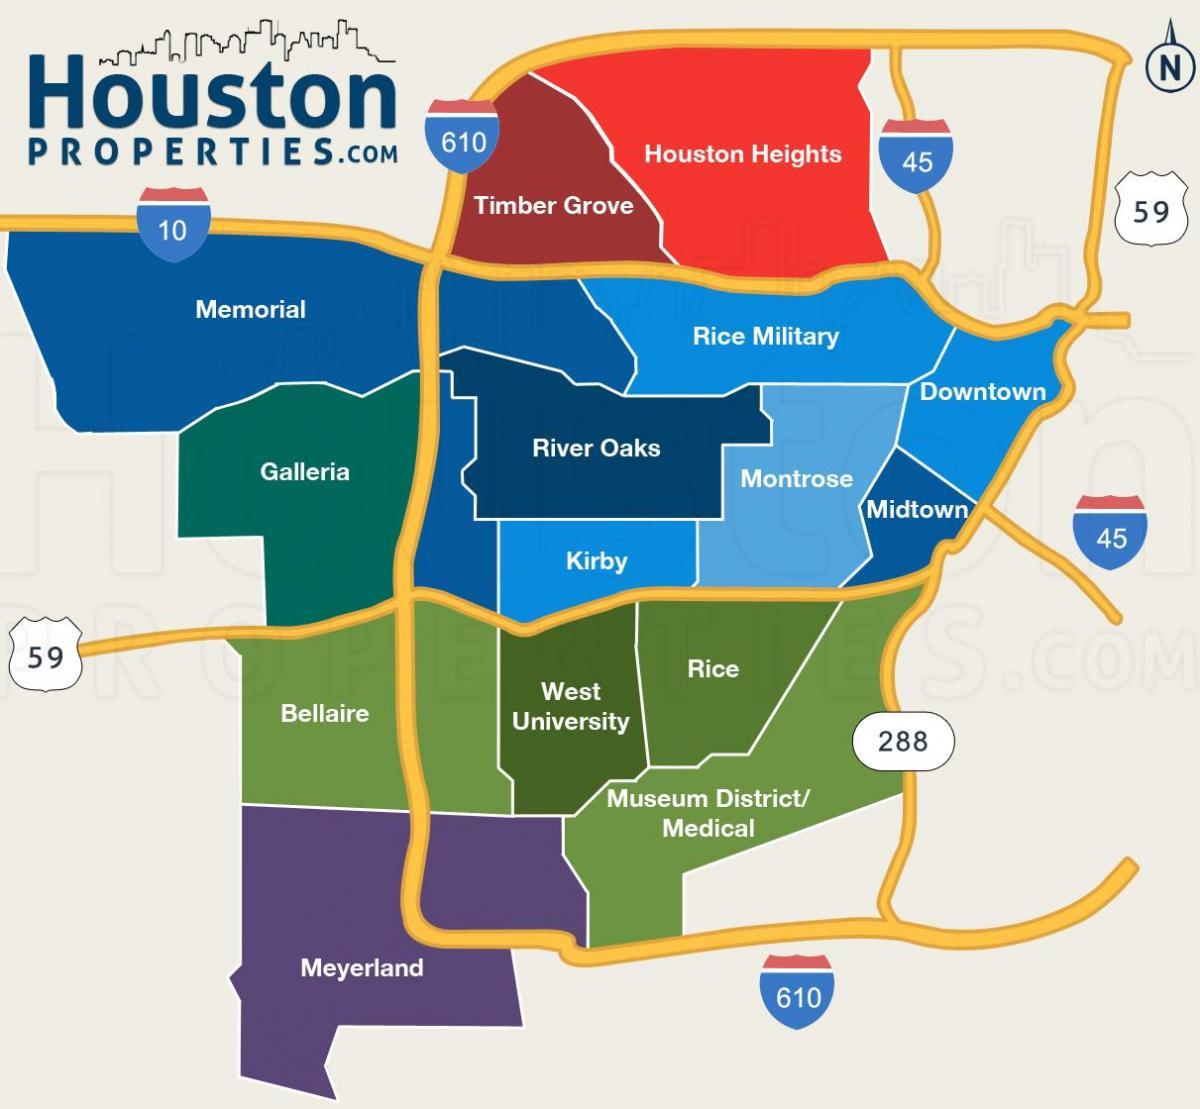 Houston school district anzeigen - HISD Schule zone-Karte (Texas - USA)